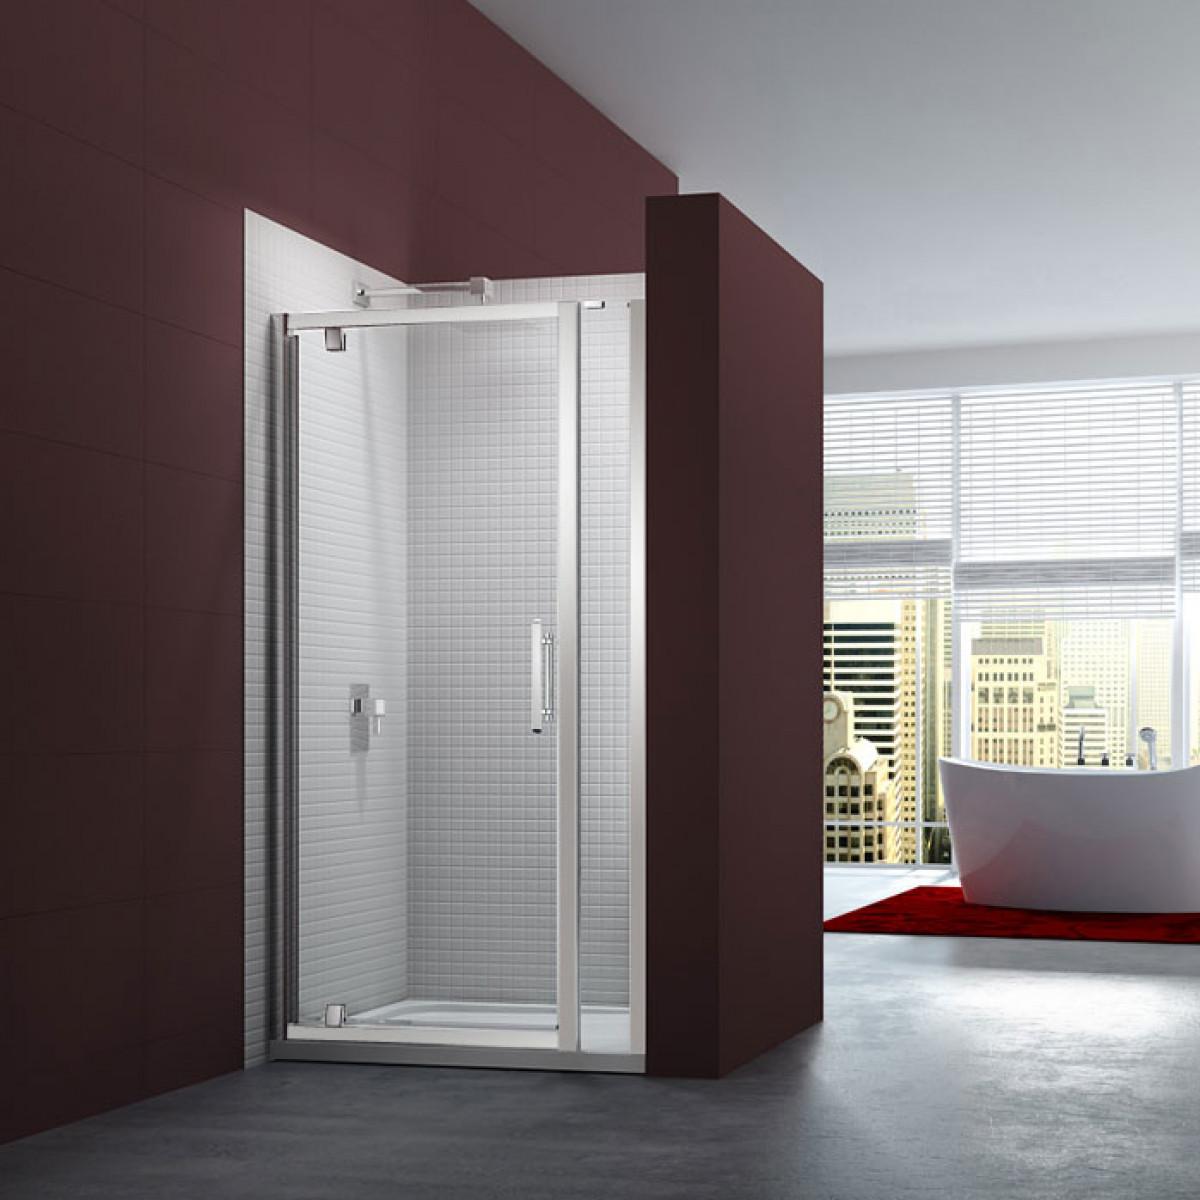 Merlyn 6 series 1000mm pivot shower door and small inline for 1000mm pivot shower door